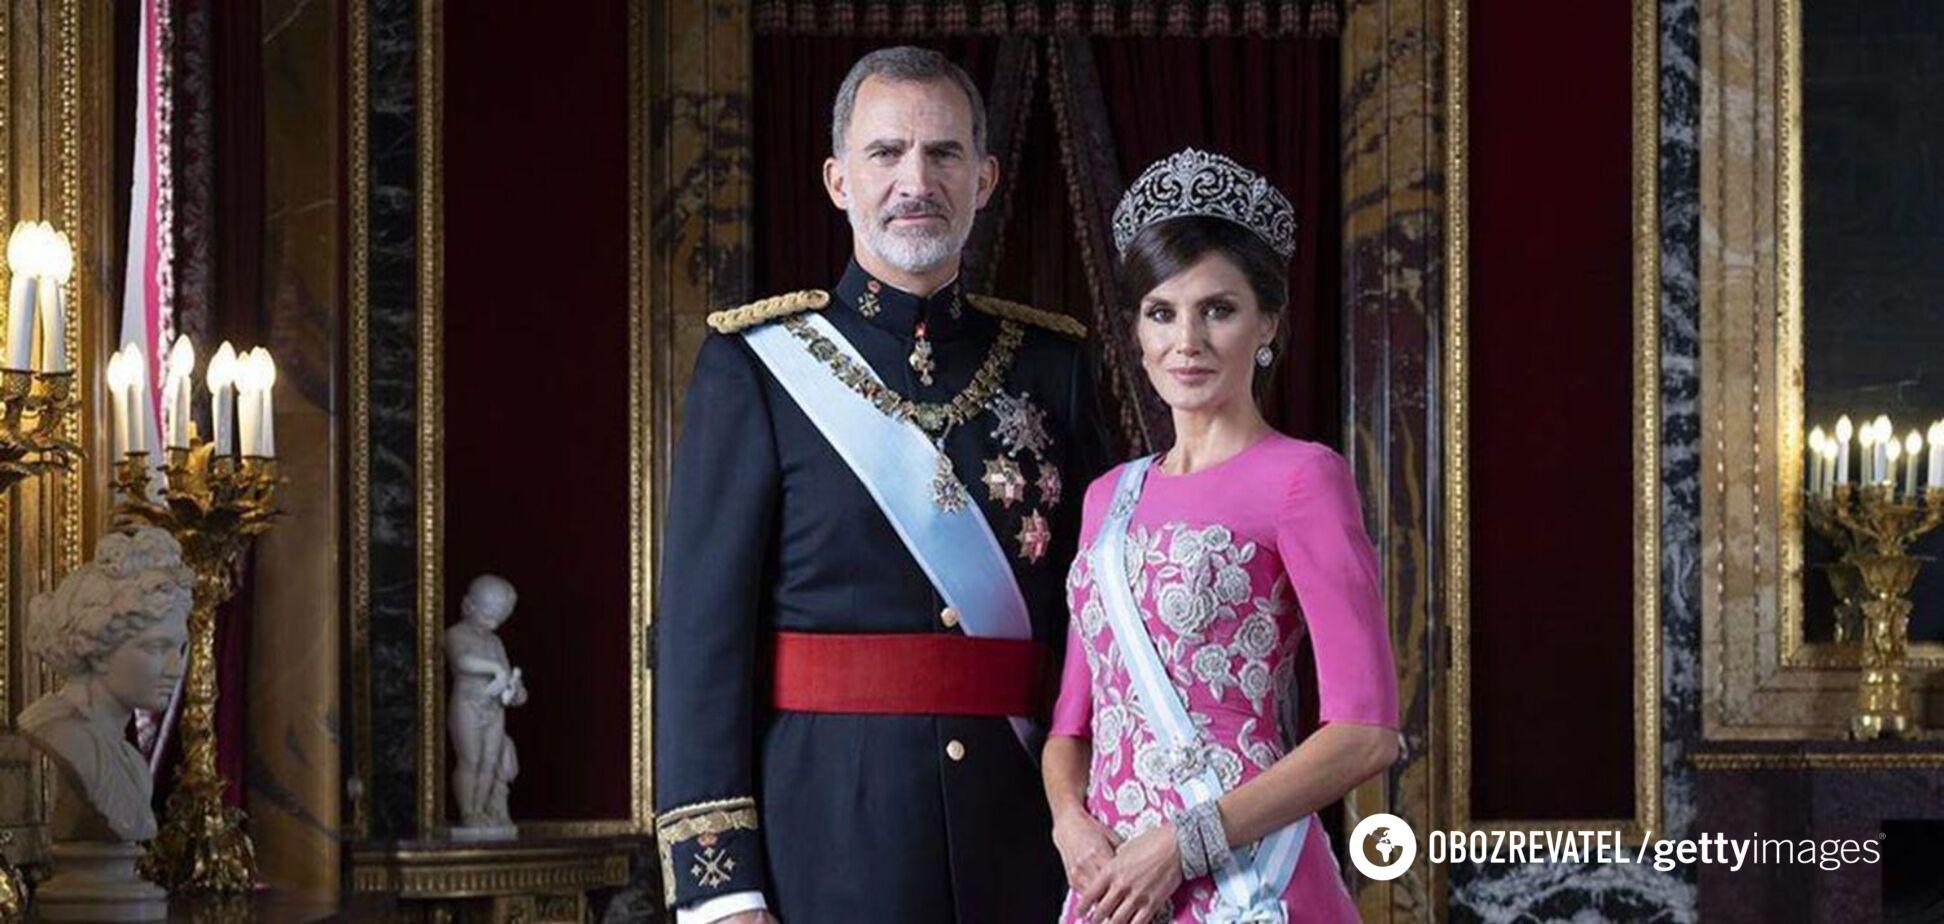 Королева Летиция пришла на встречу в трендовом наряде 2021 года. Фото